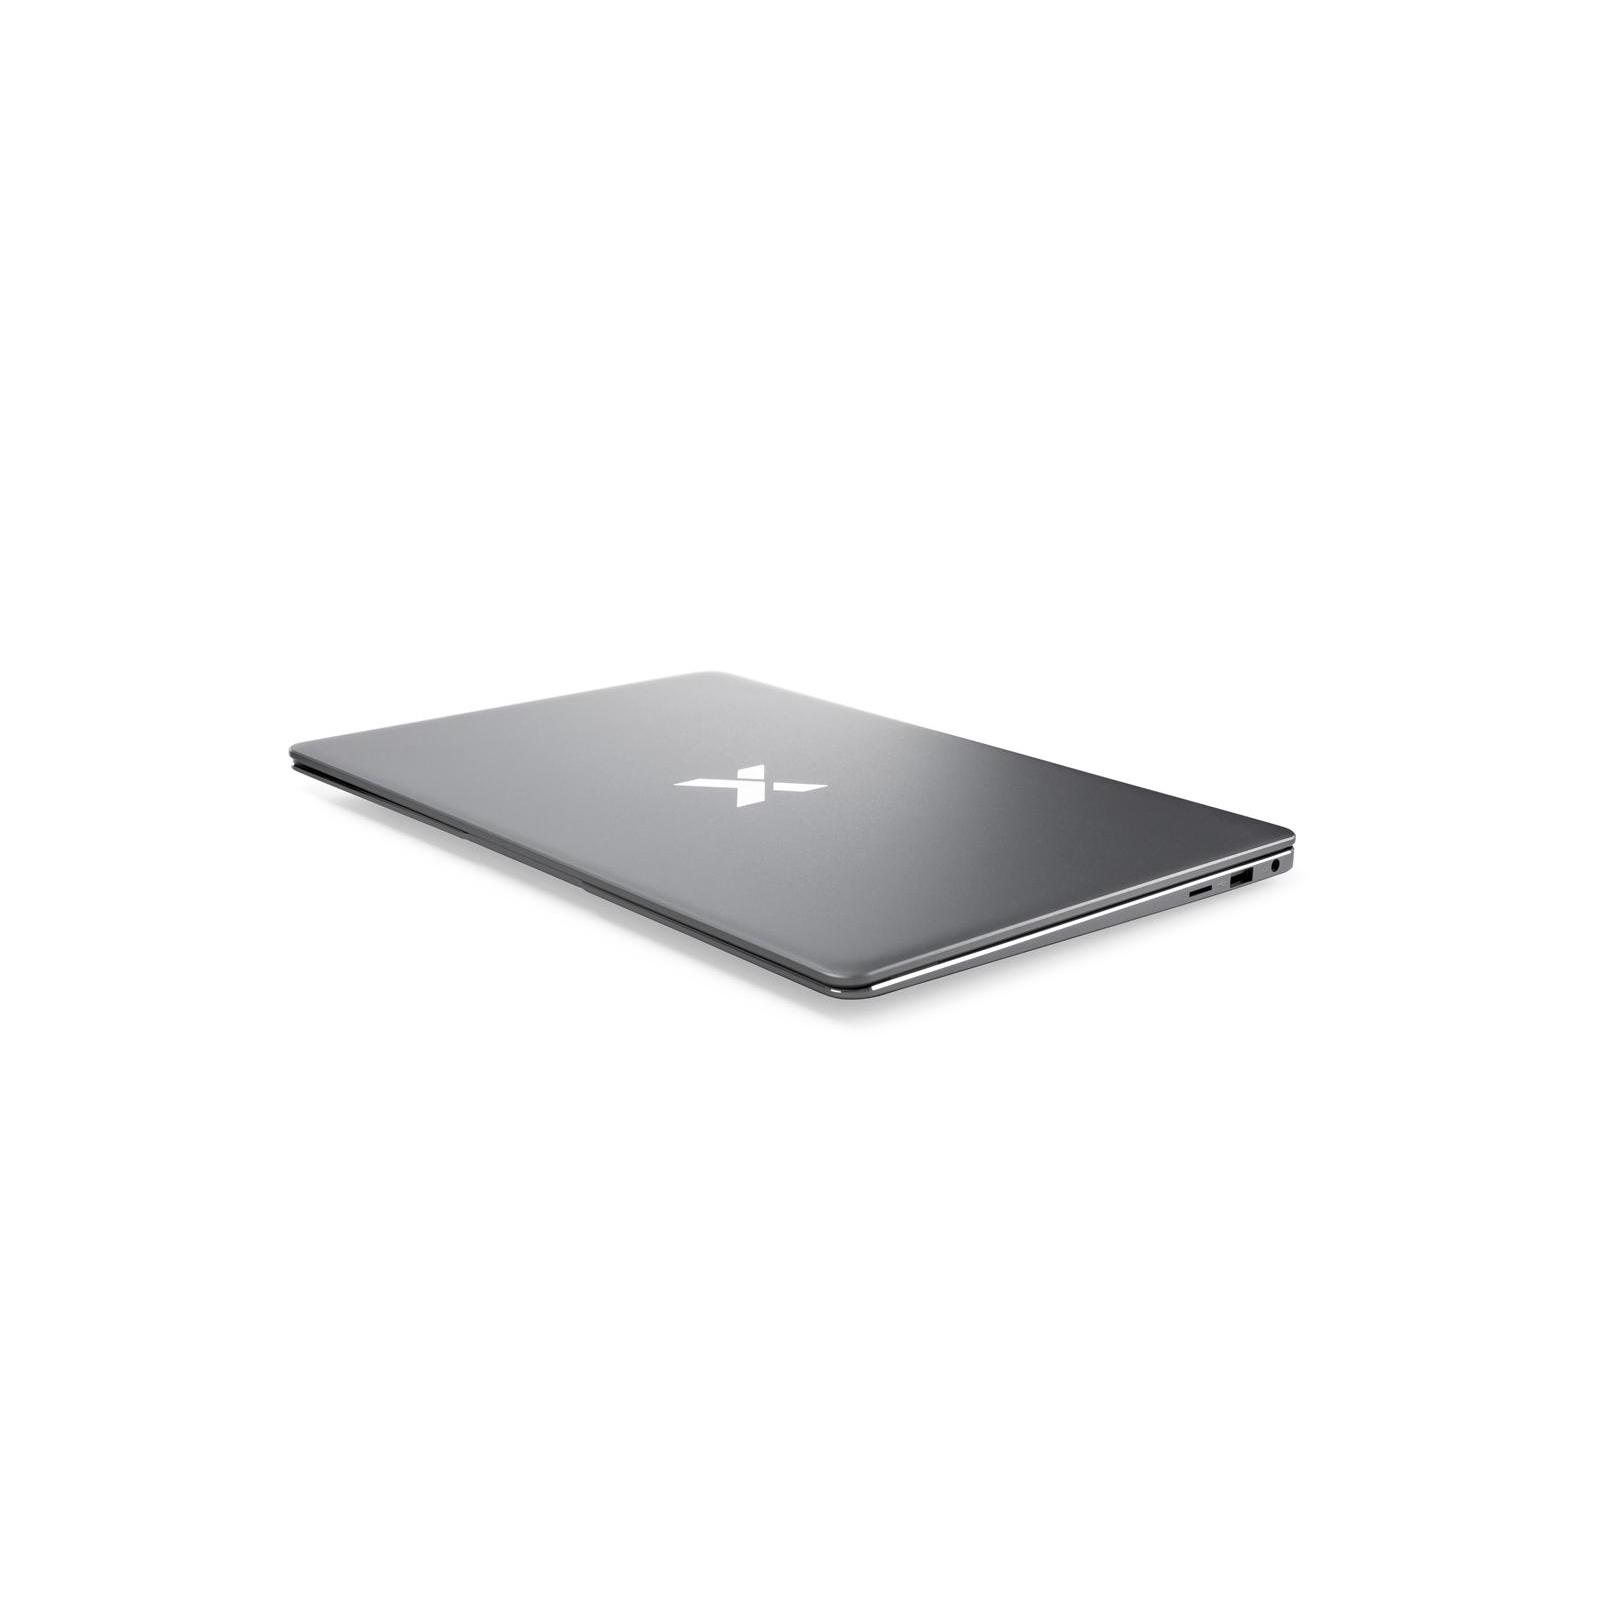 Ноутбук Vinga Iron S140 (S140-P50464G) изображение 6